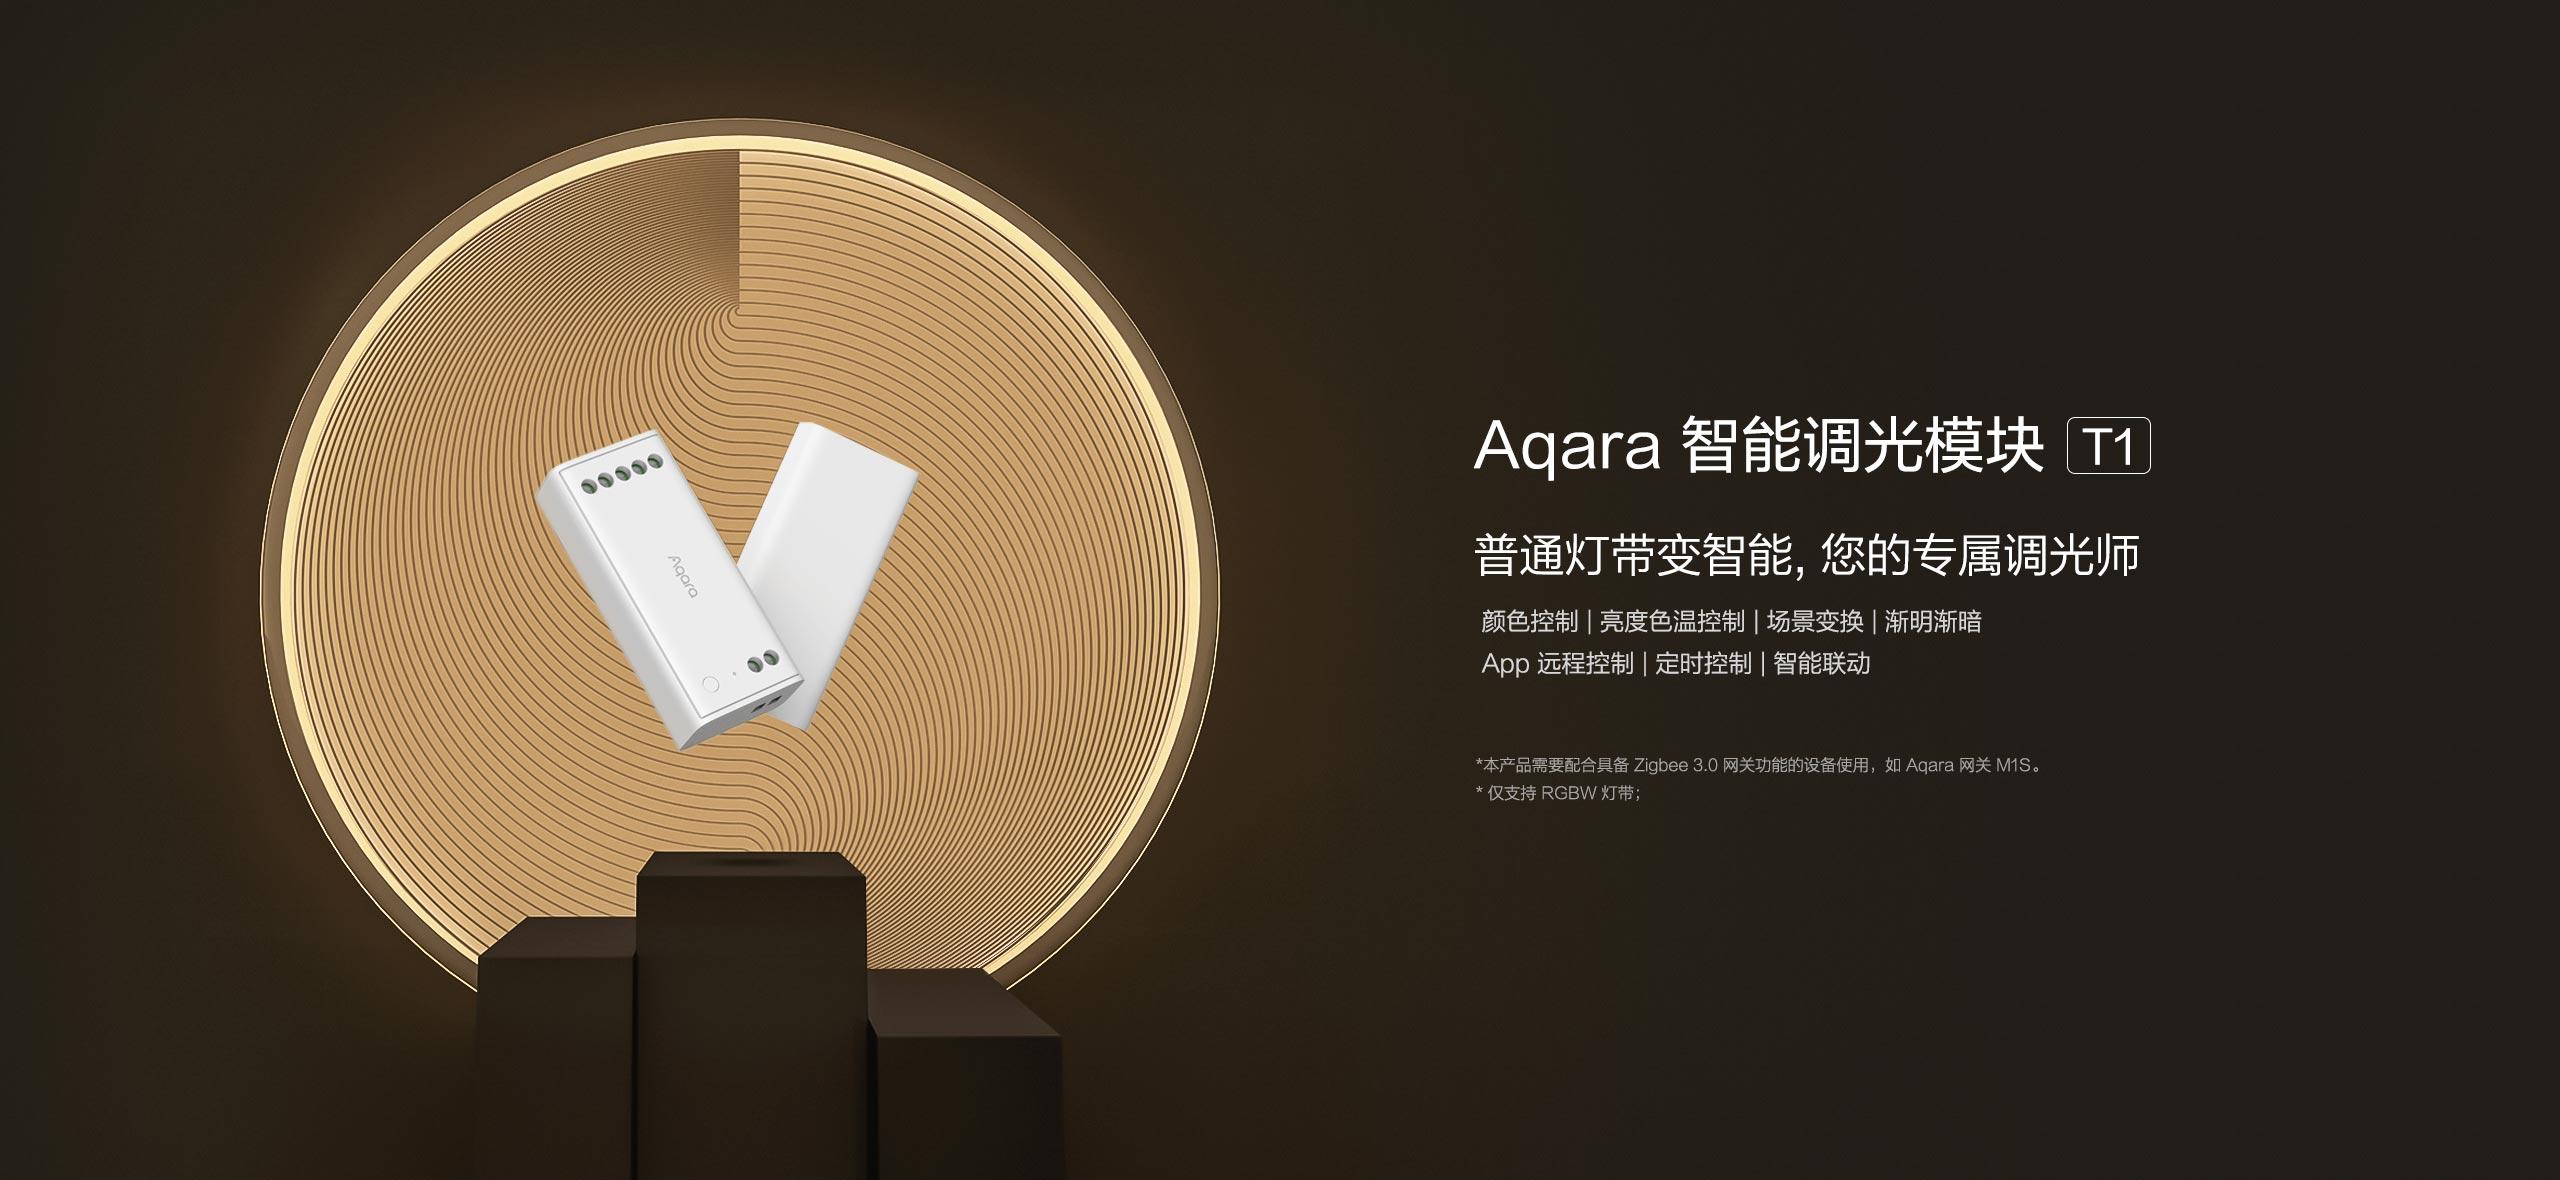 Aqara 智能调光模块 T1